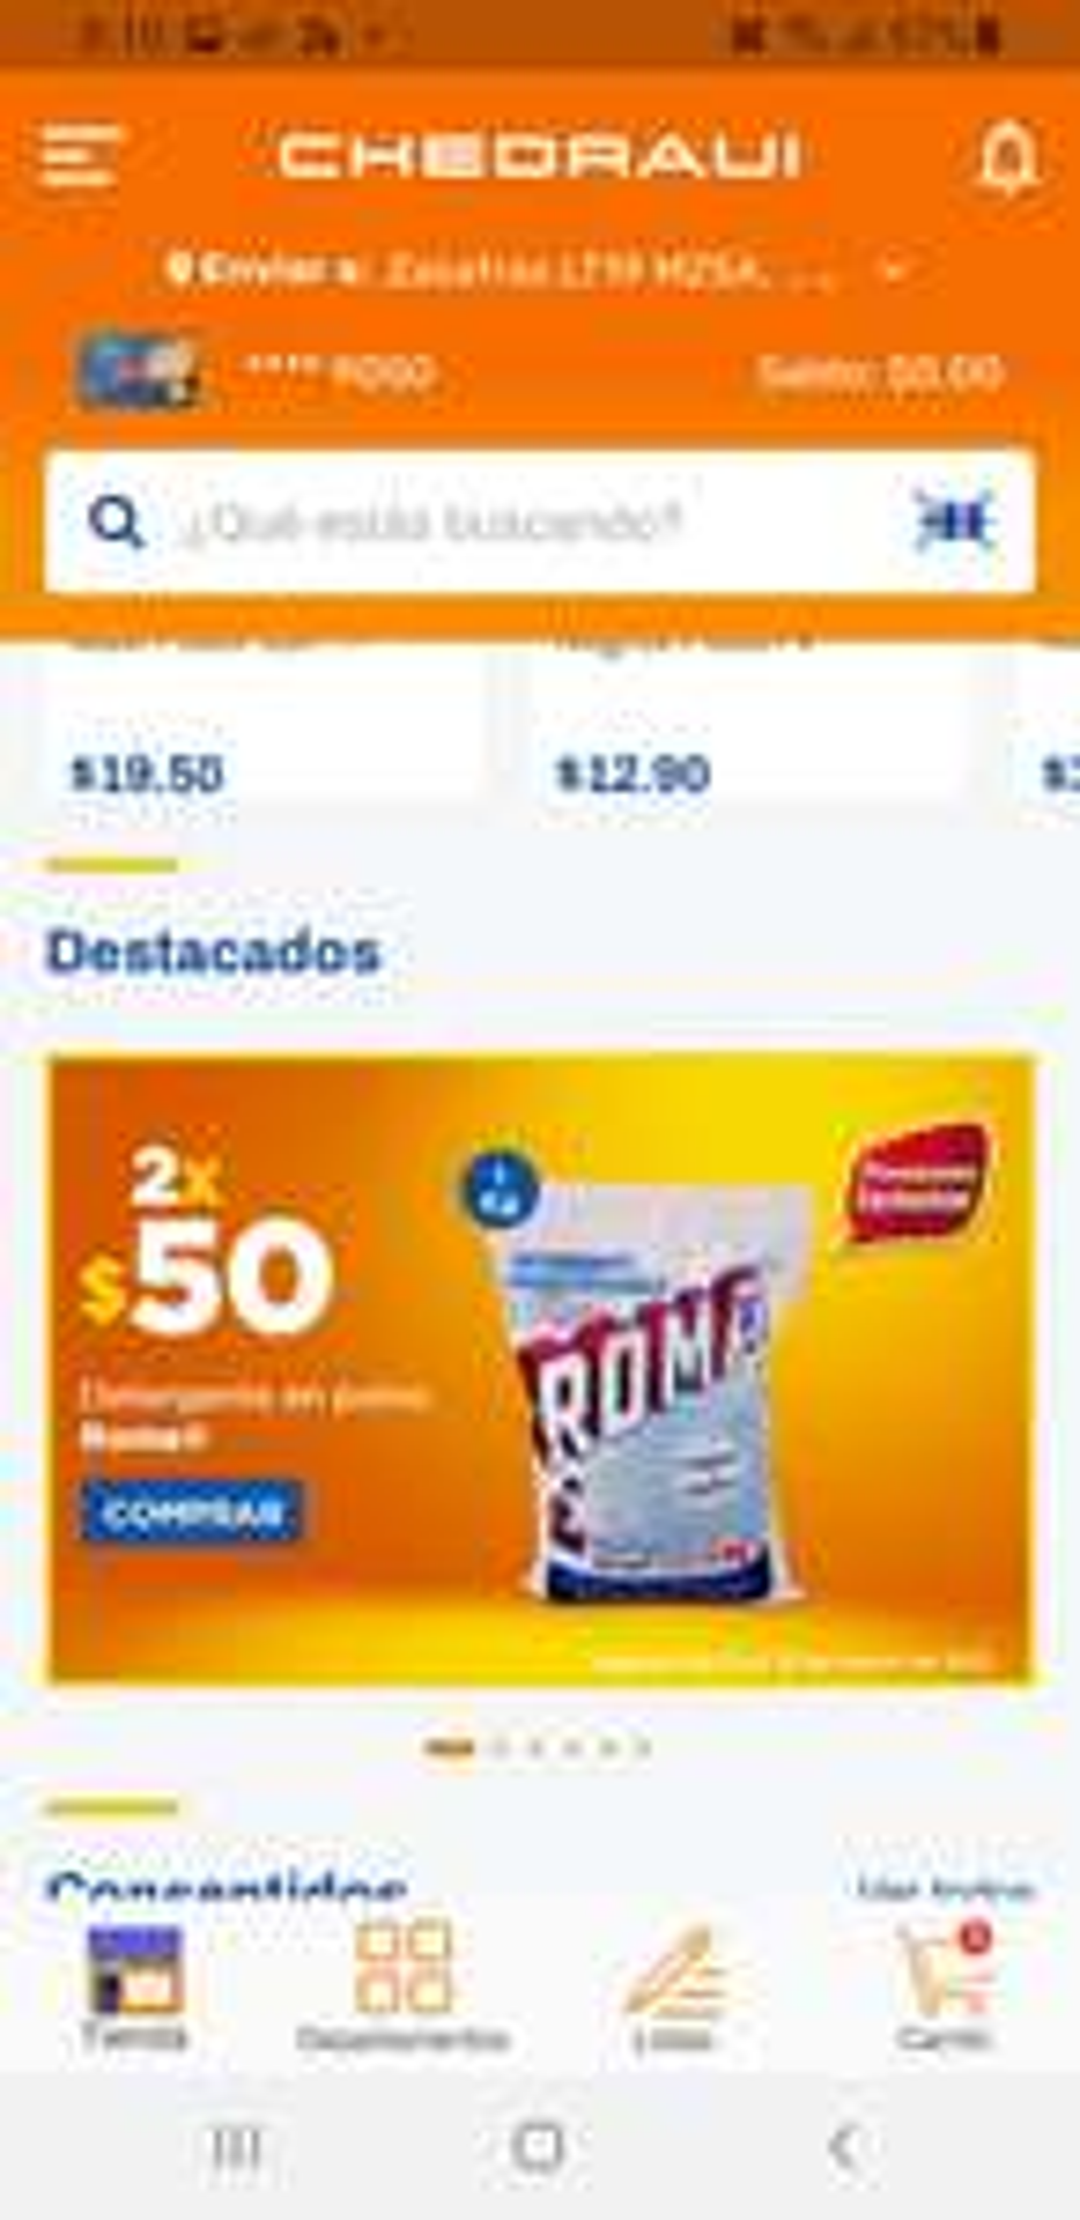 CHEDRAUI: JABON ROMA DE 1KG, 2*$50